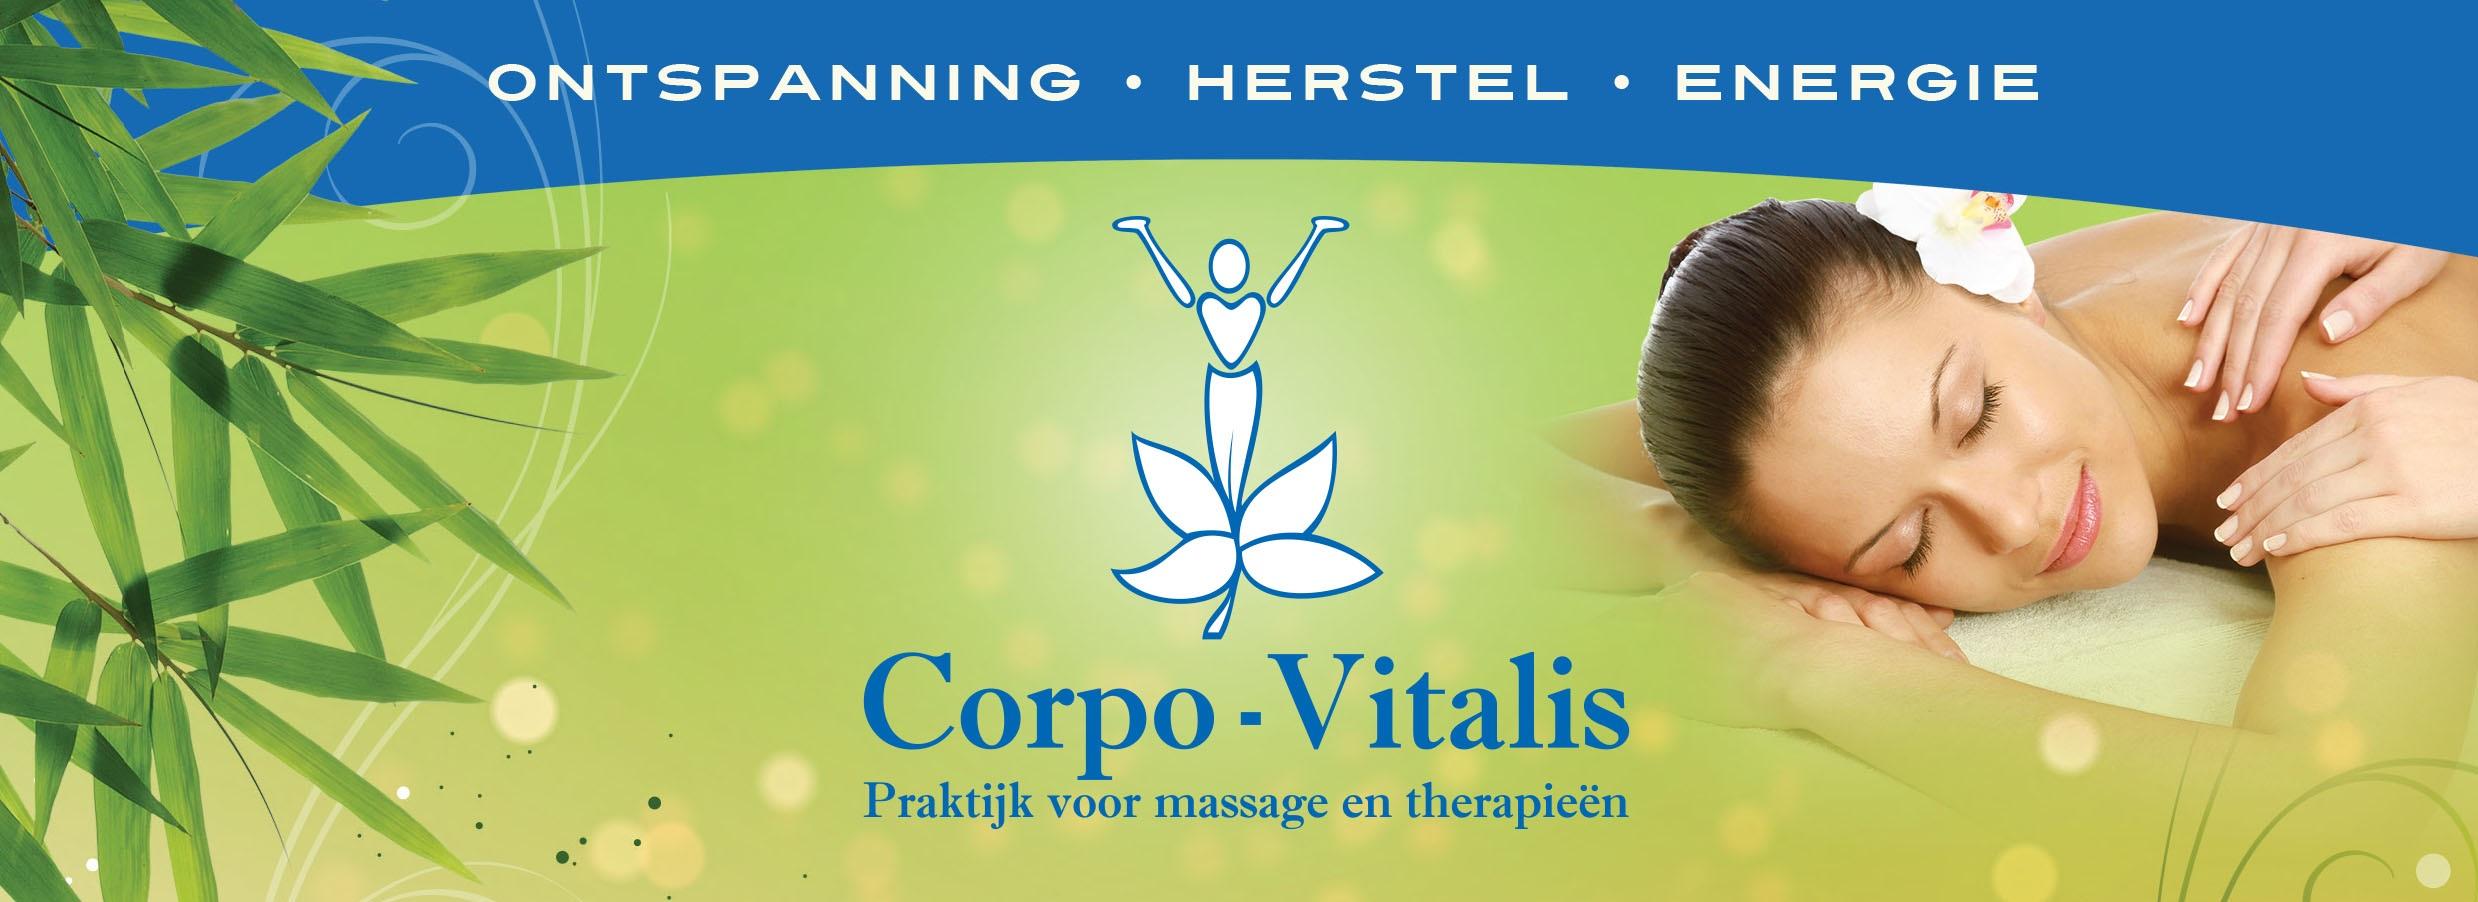 Corpo-Vitalis